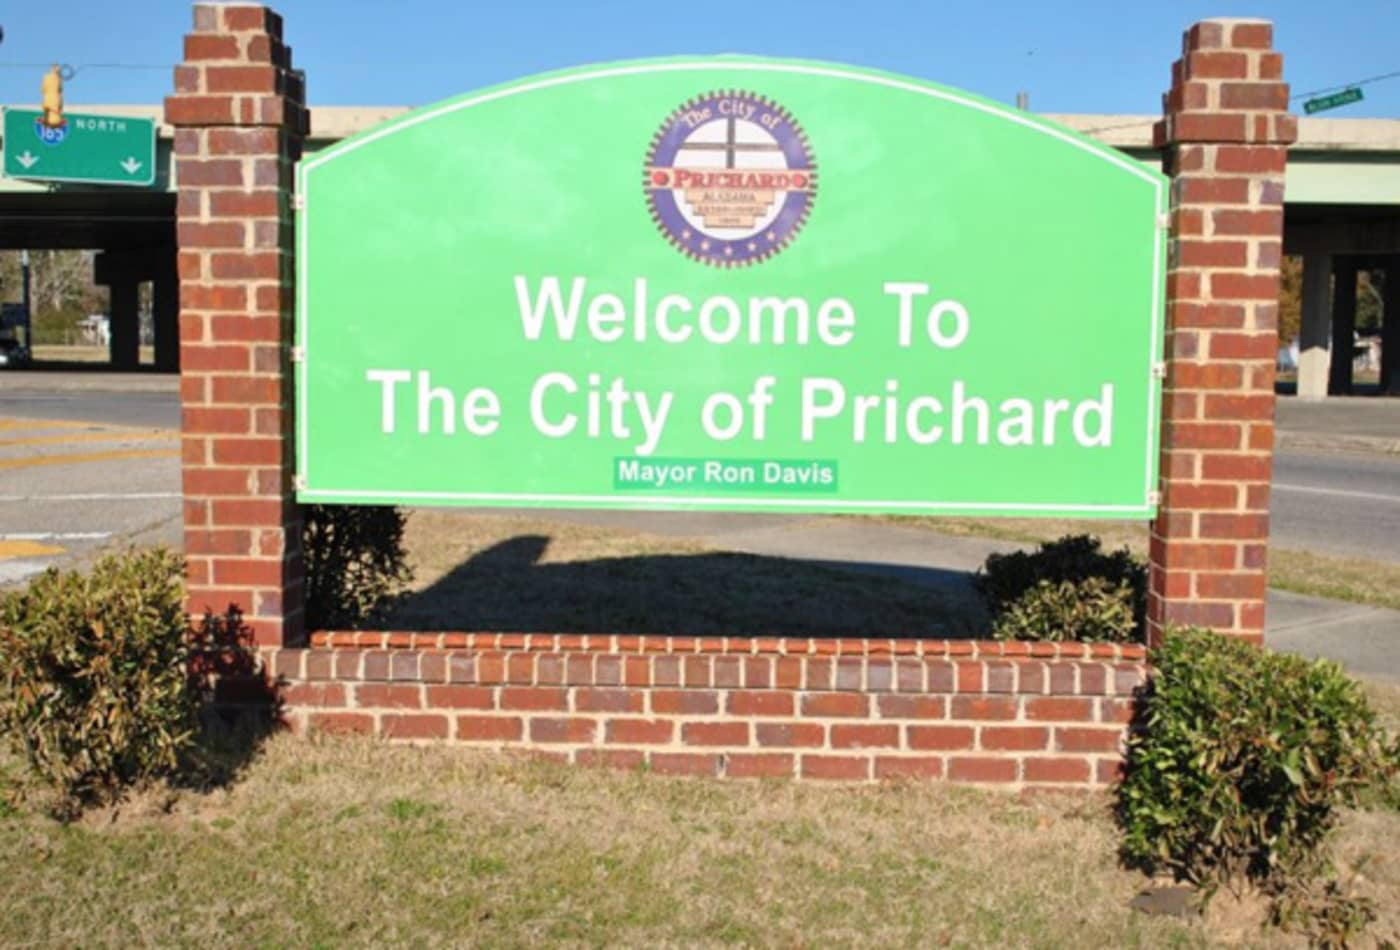 US-municipalities-that-went-bankrupt-pichard.jpg